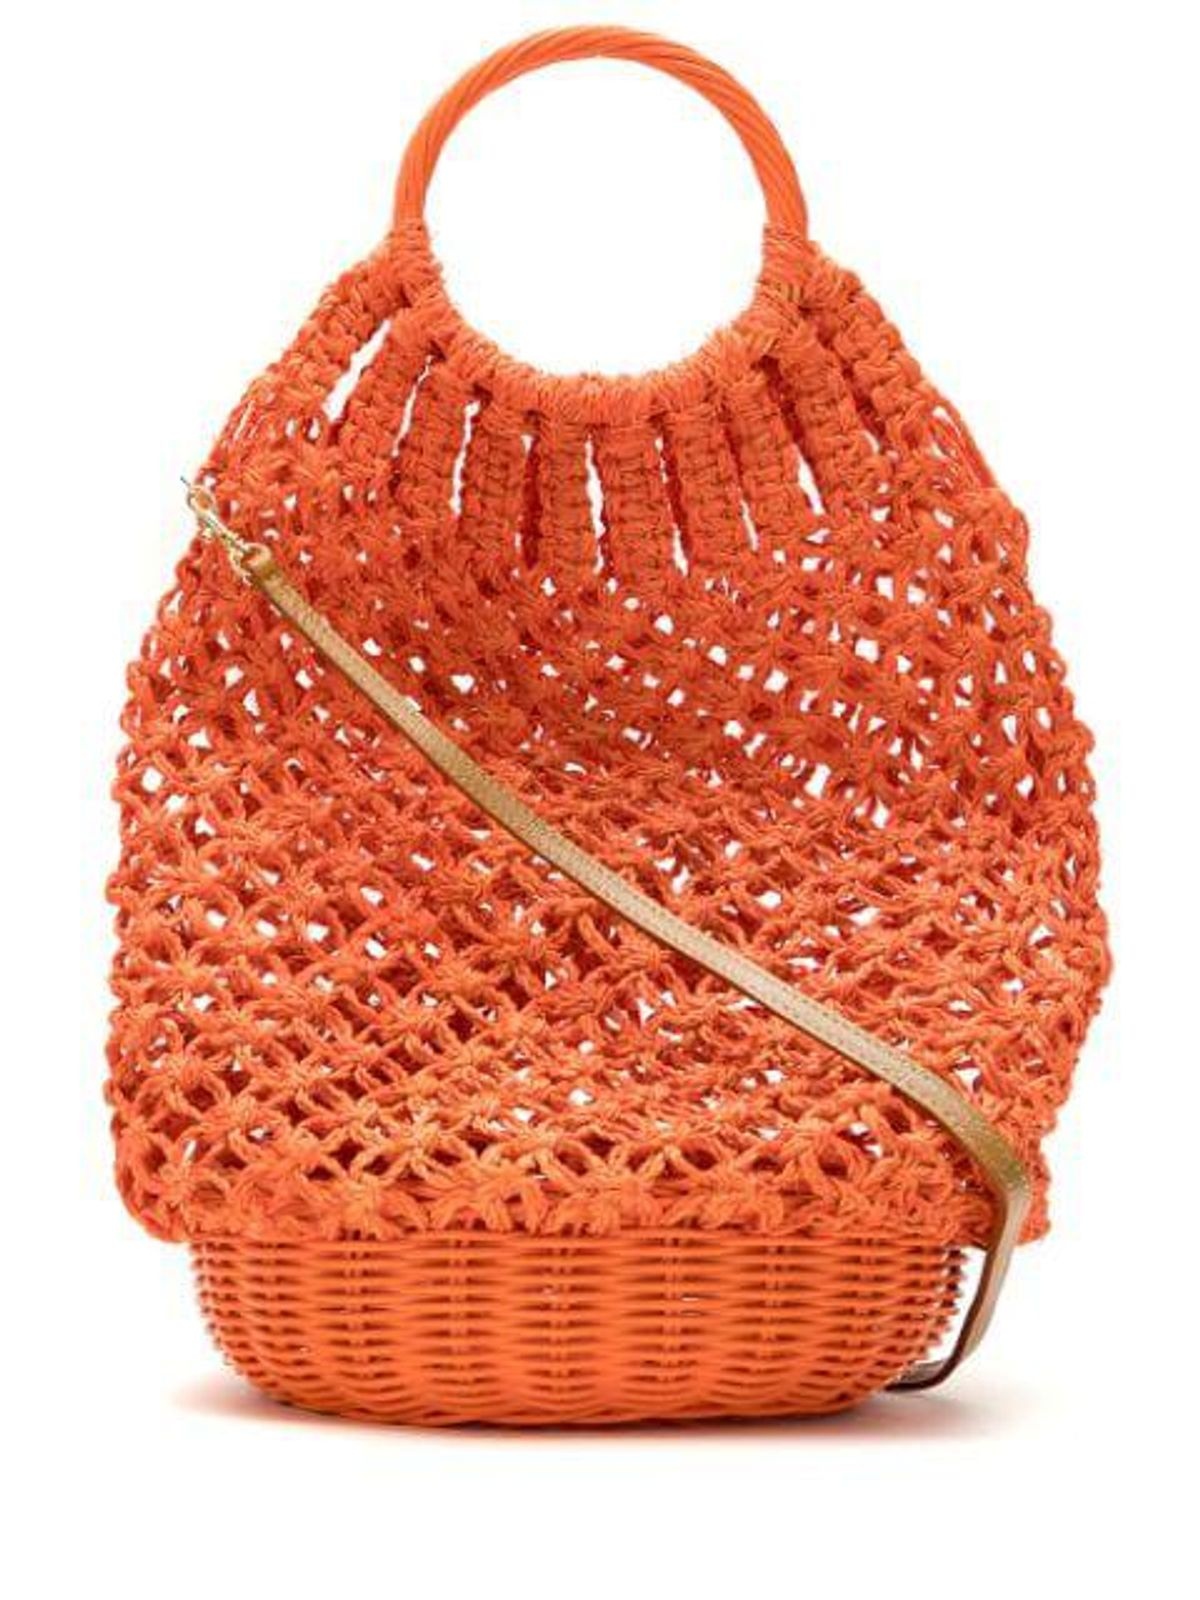 Lara Crochet Basket Bag